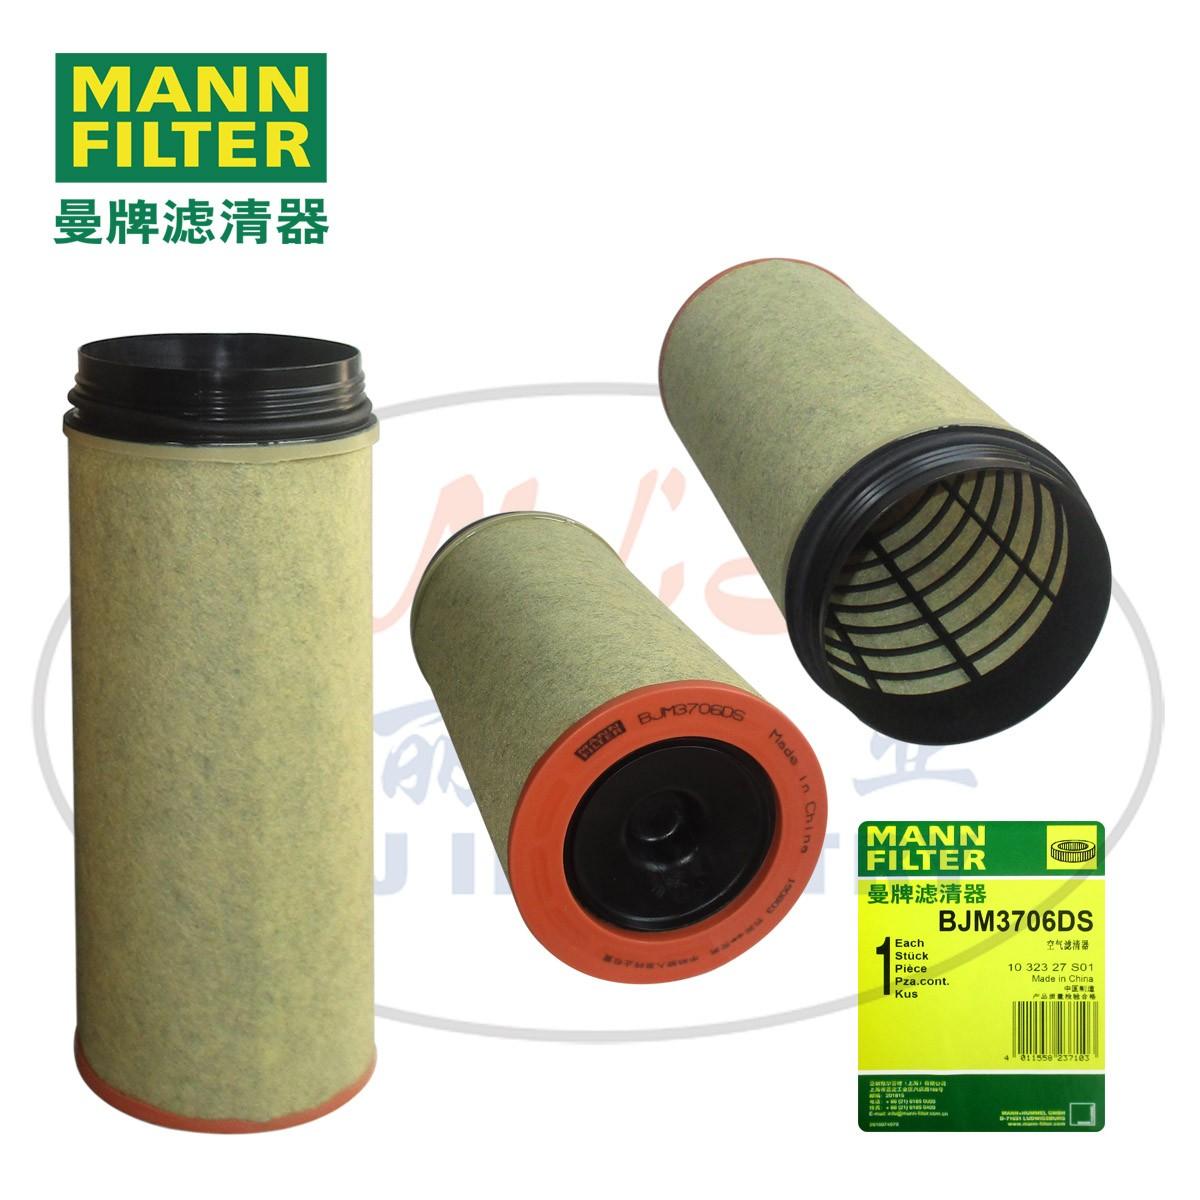 MANN-FILTER曼牌滤清器 滤芯 BJM3706DS